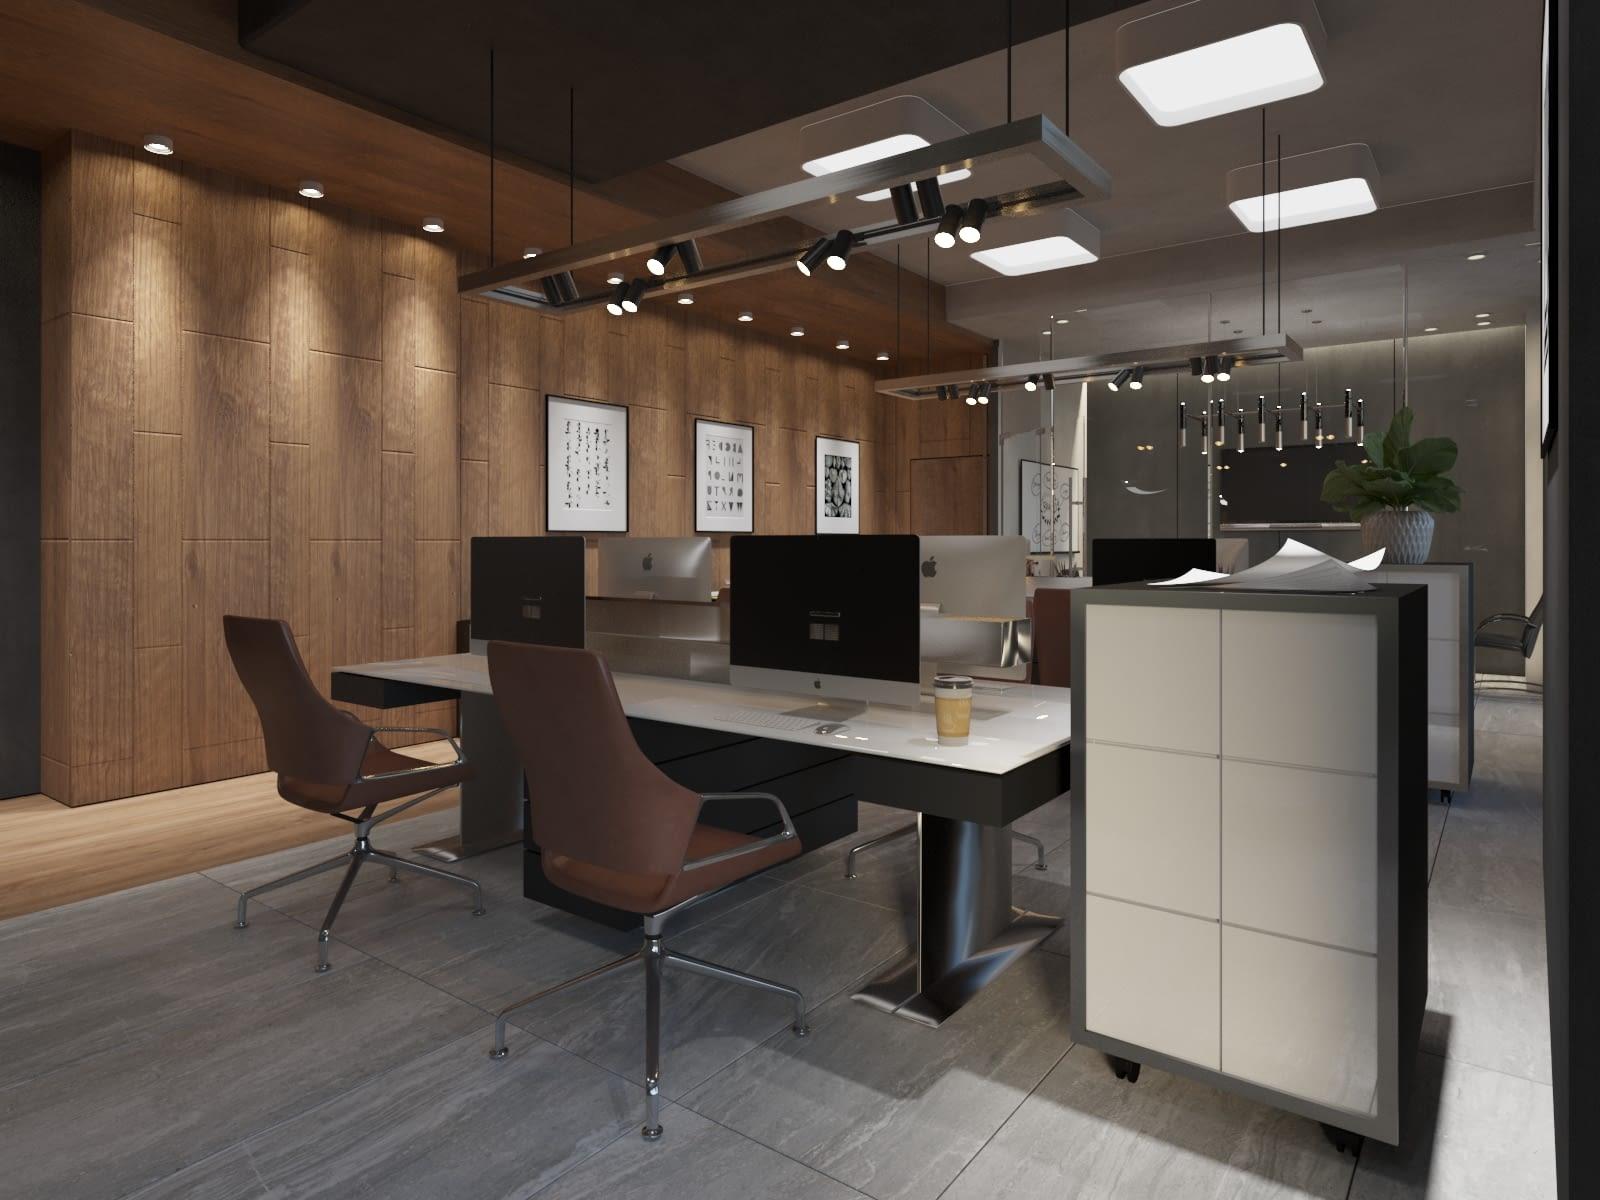 office1_Interactive LightMix_View02